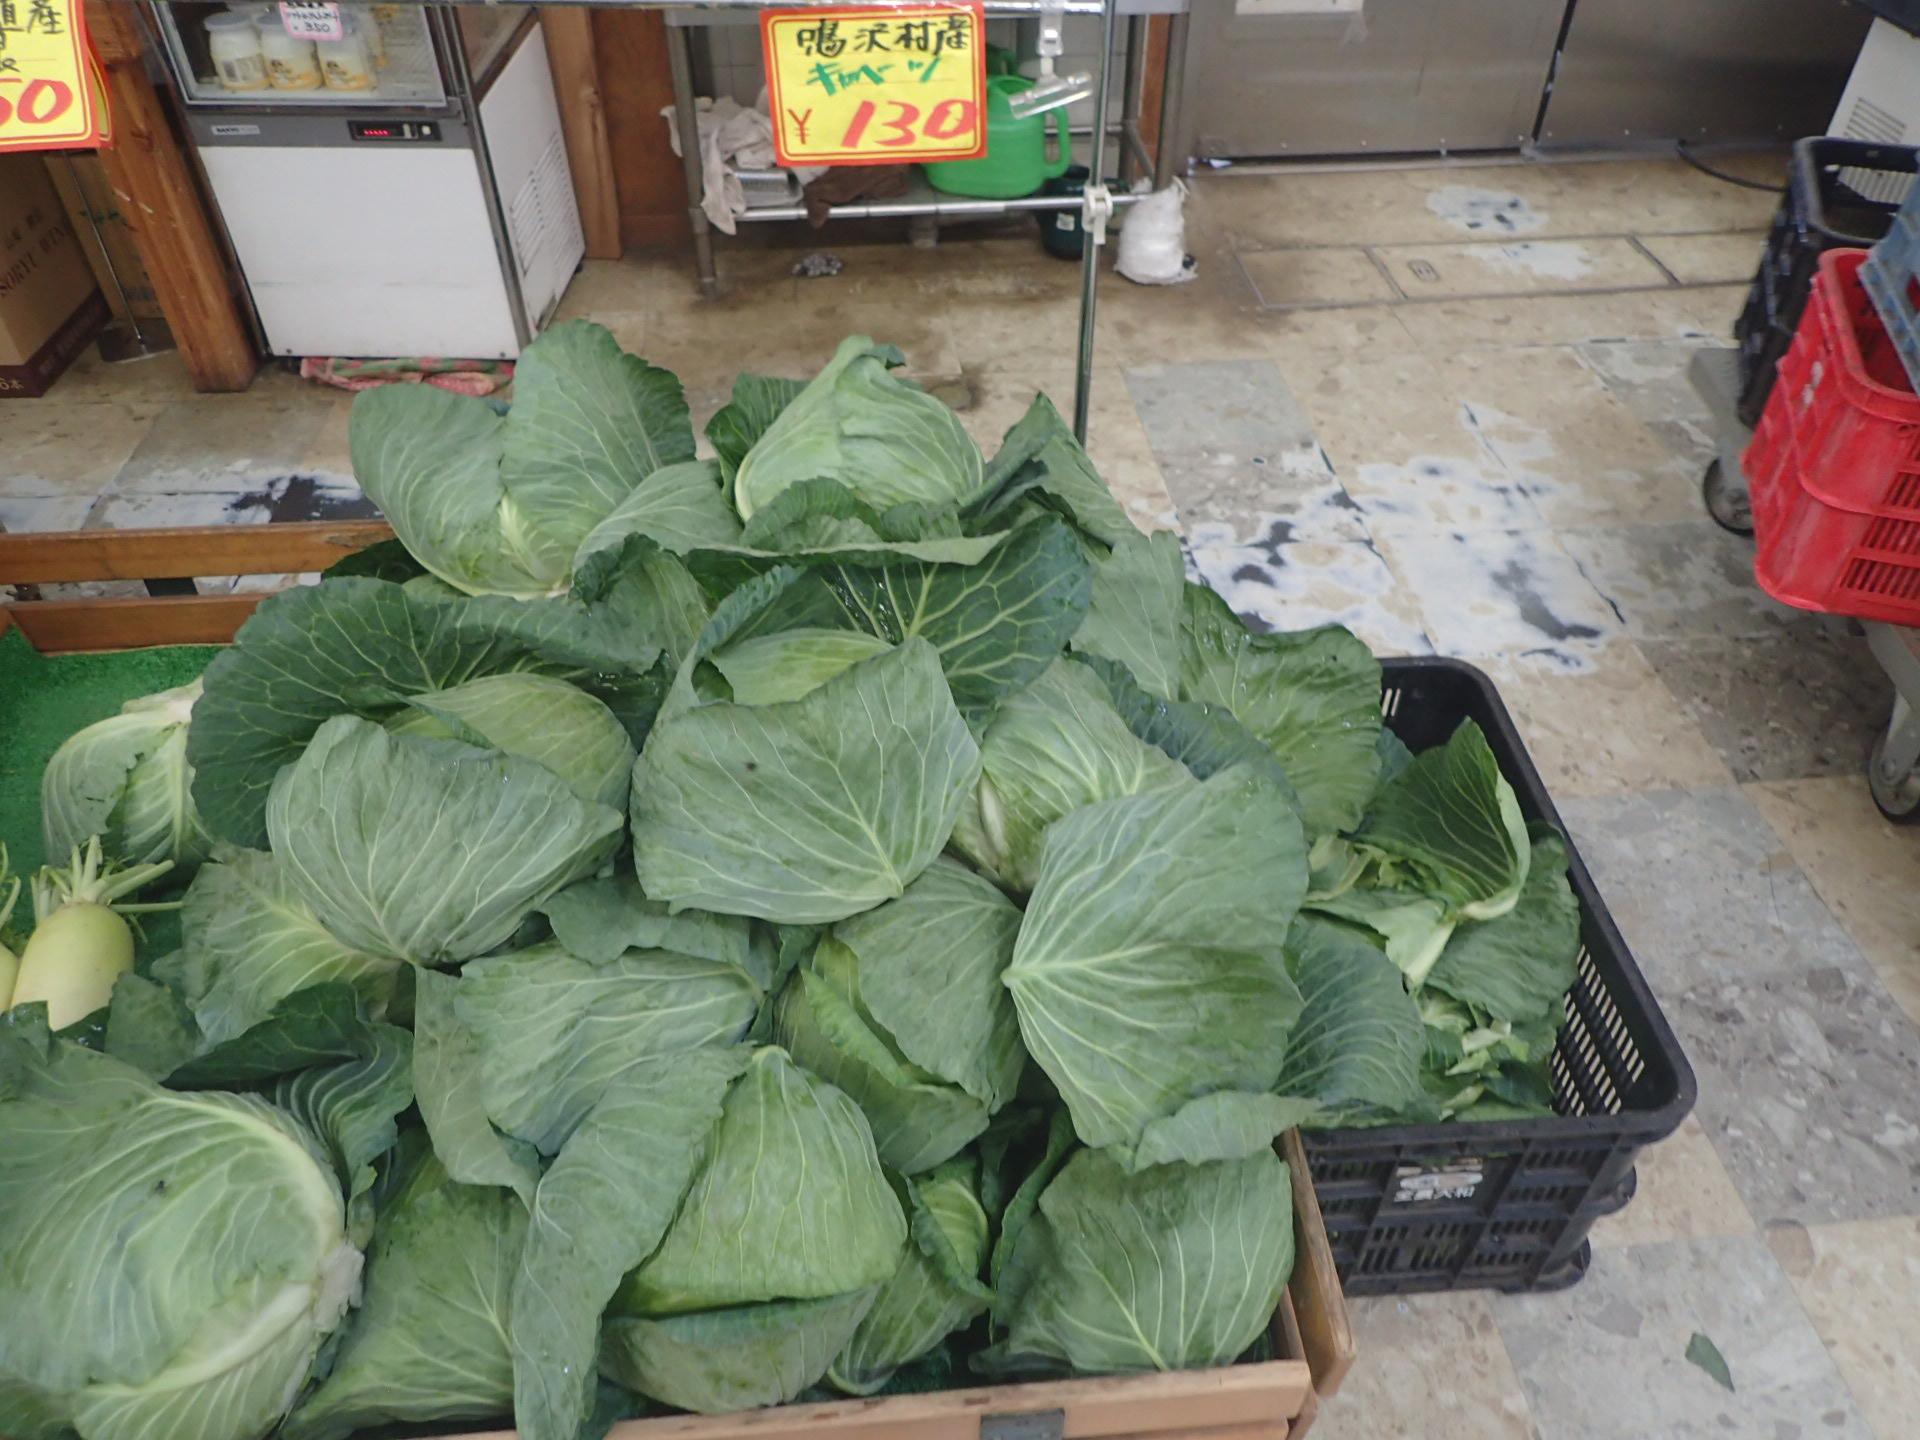 http://www.yamanashi-kankou.jp/blog/PA110131.JPG